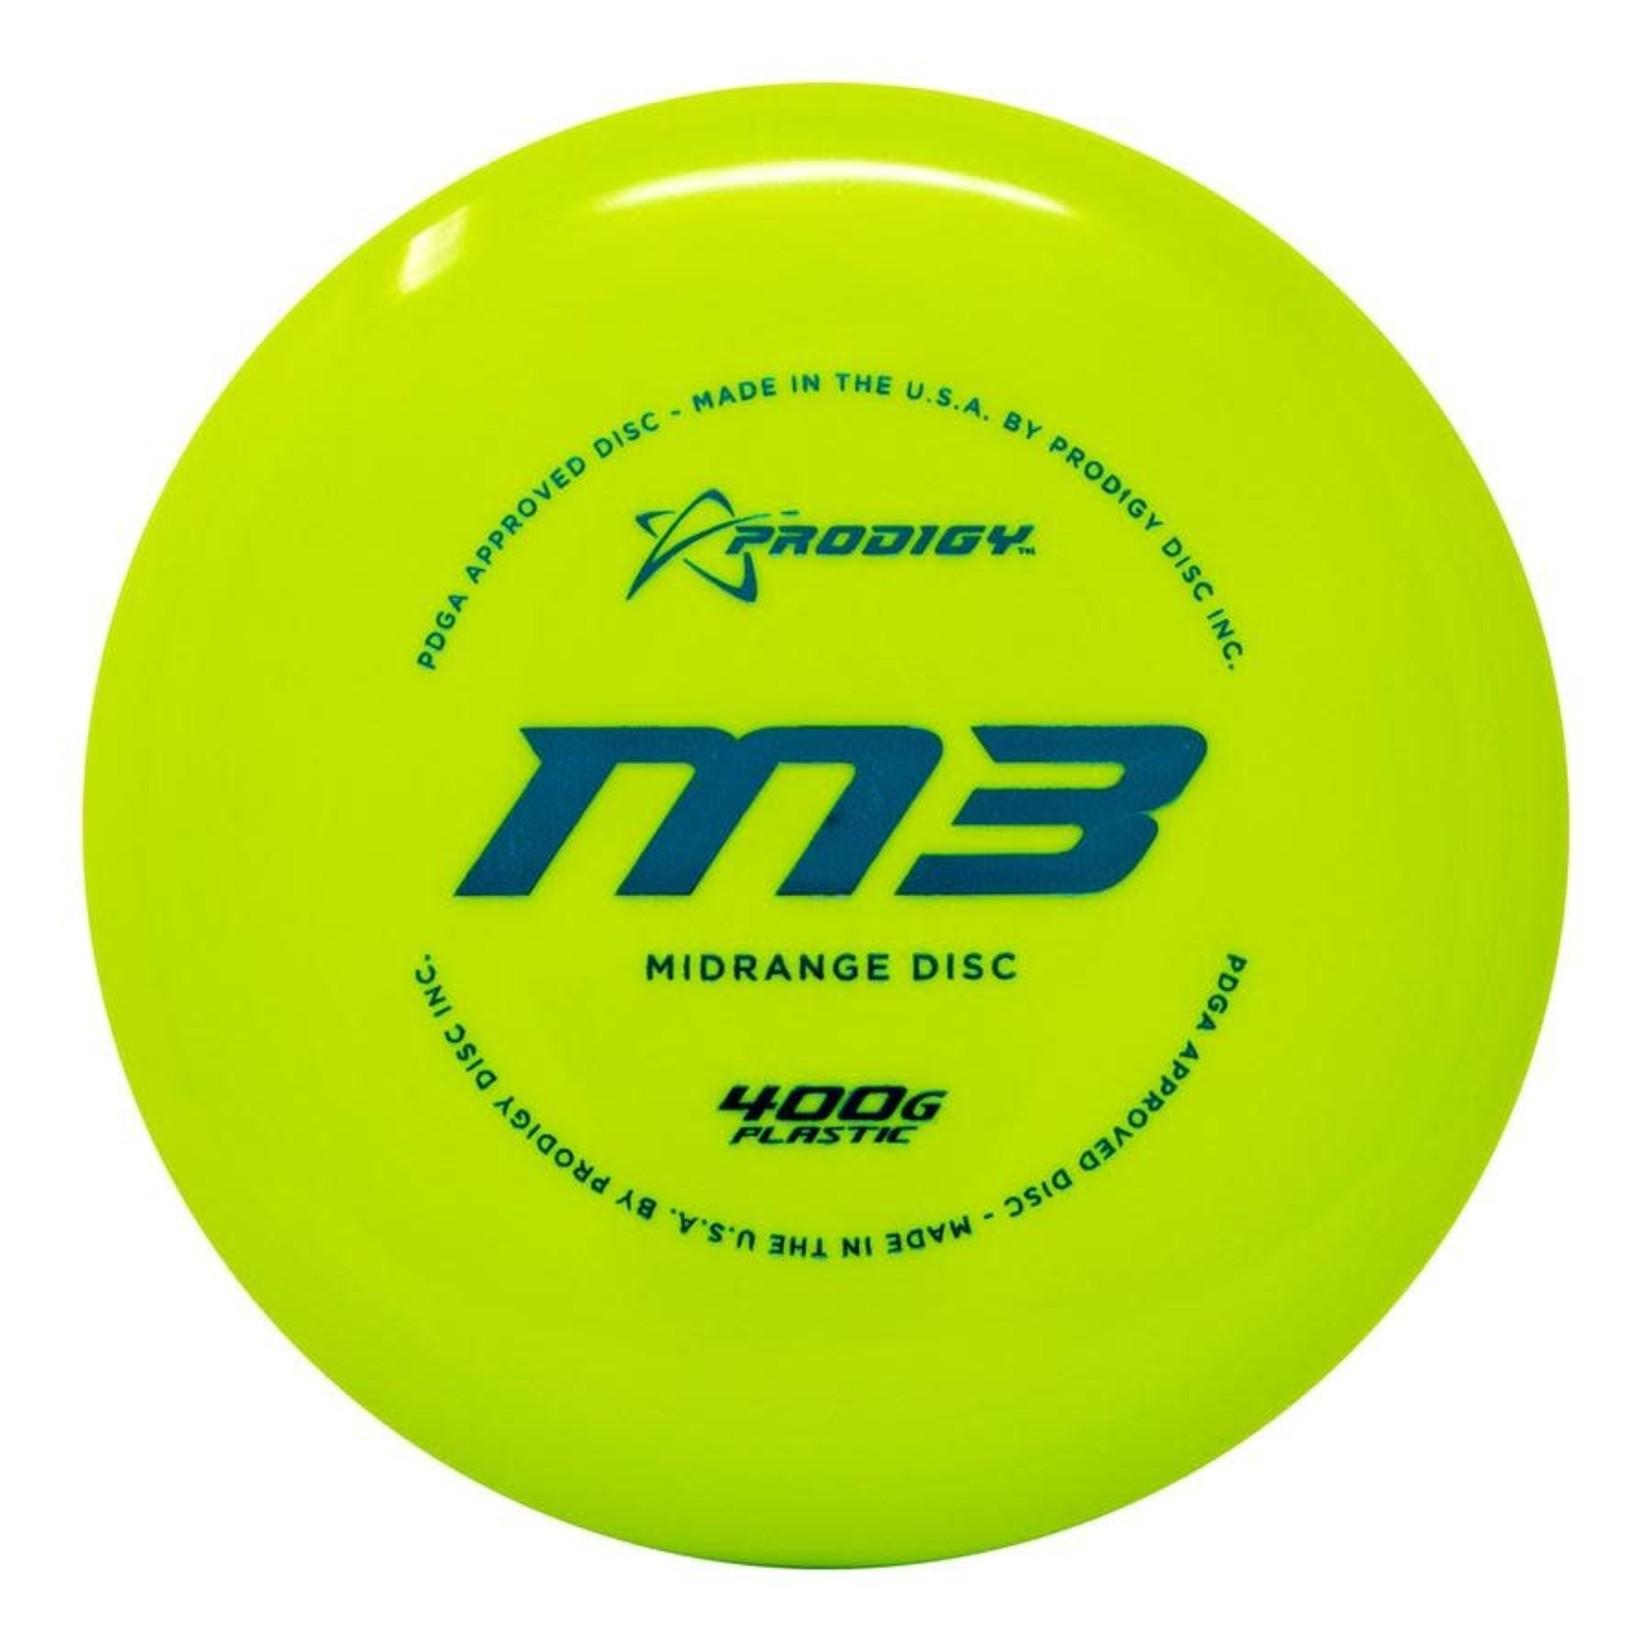 Prodigy Prodigy Disc, M3 Midrange Driver, M3-4G-180